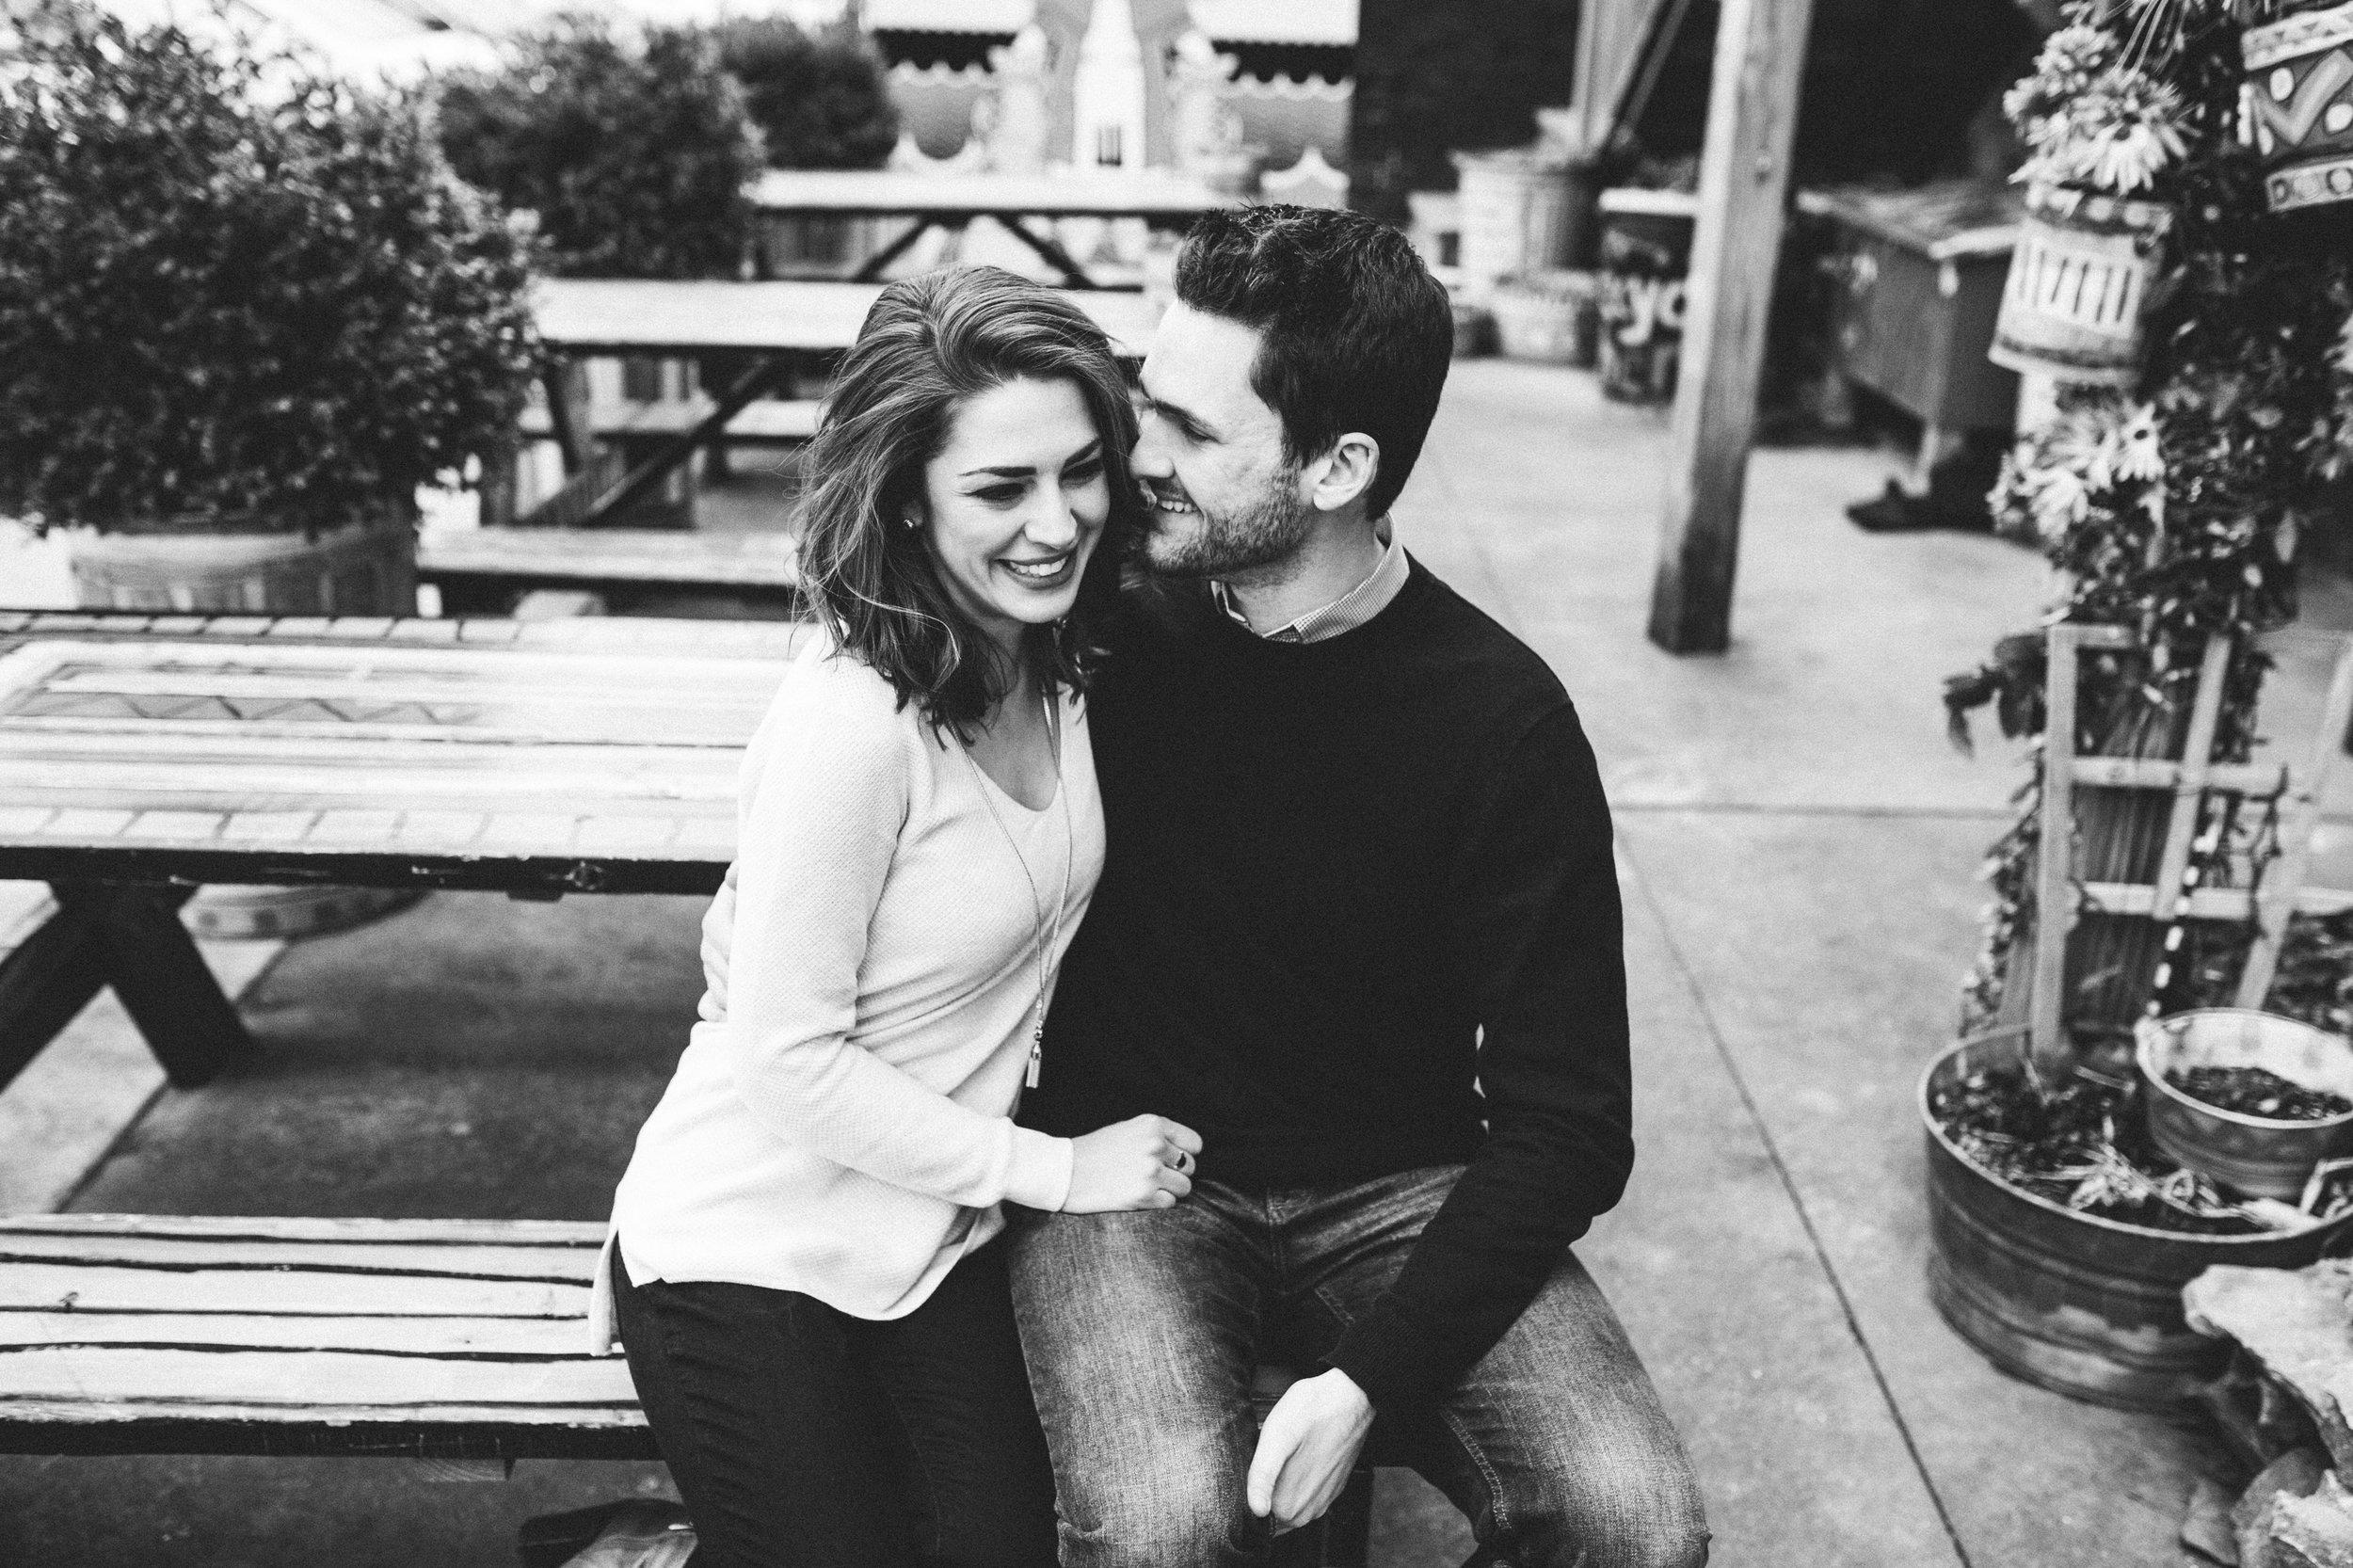 Ellen & Lee Engagement 2018 WEBSITE SP Crystal Ludwick Photo (40 of 54).jpg